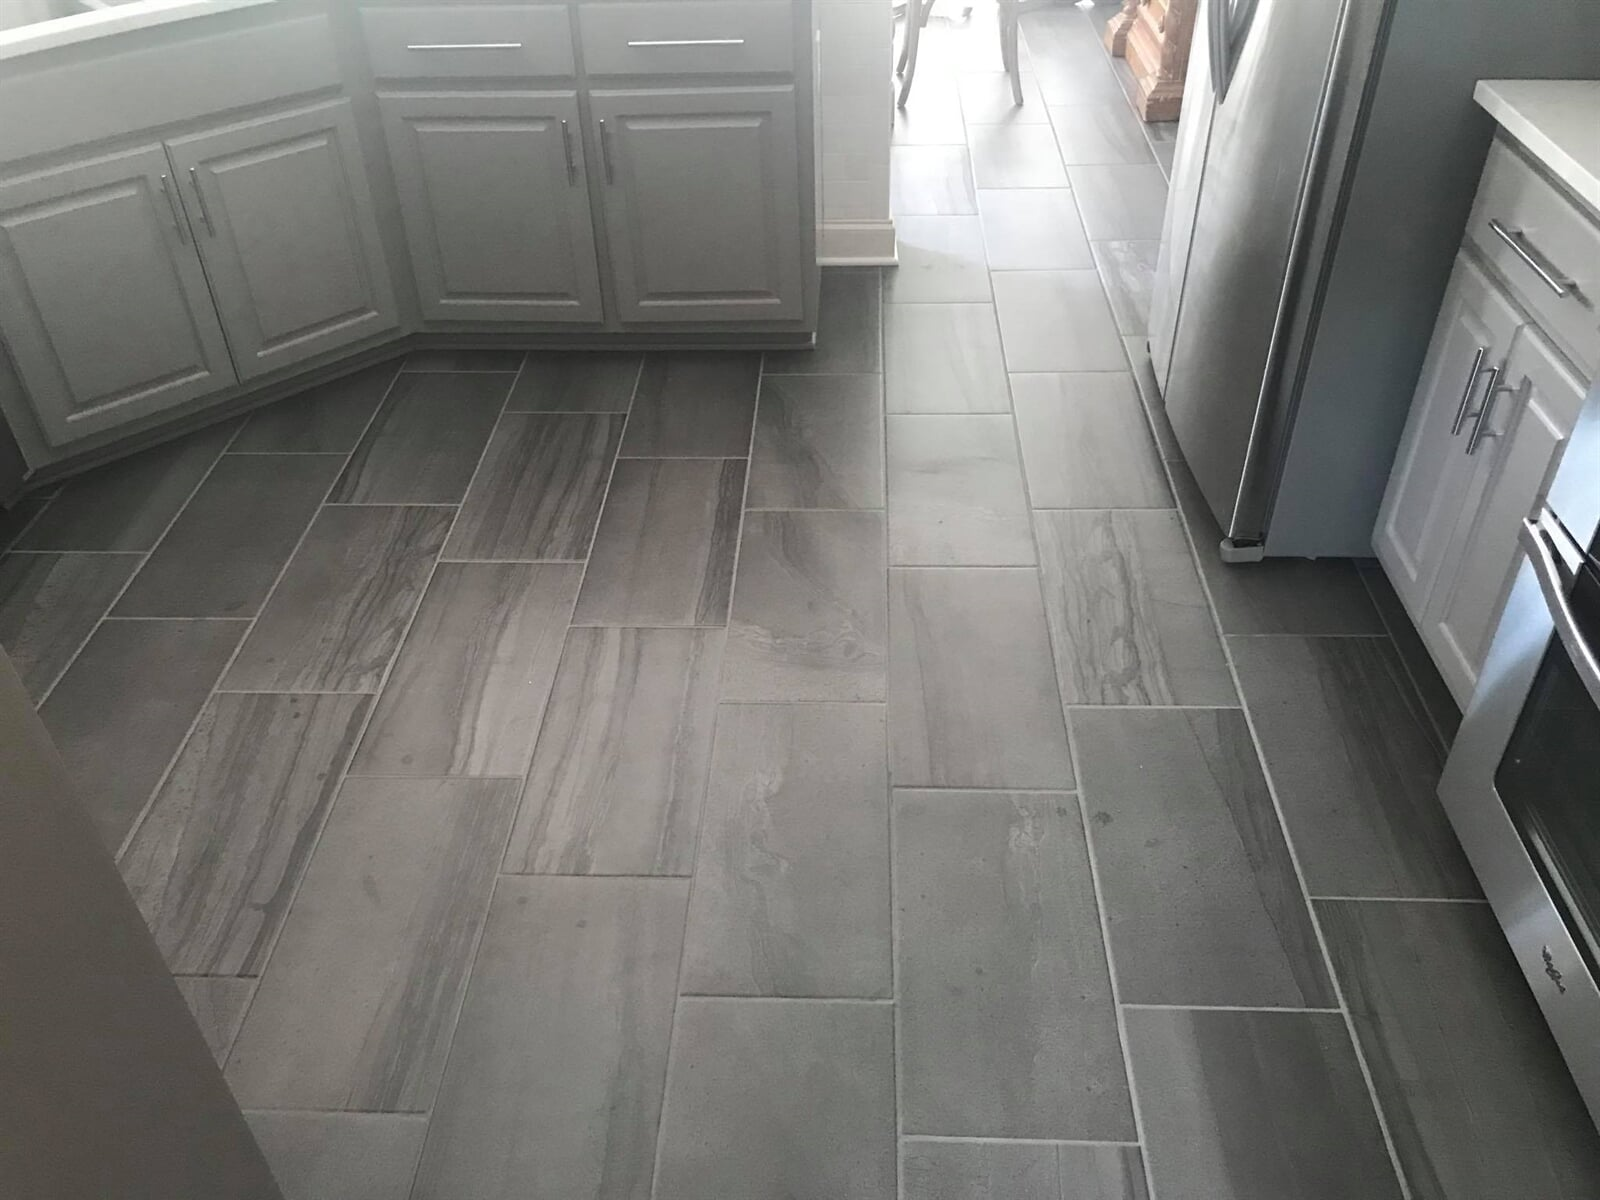 Kitchen tile installation in Watkinsville, GA from Carpets Unlimited